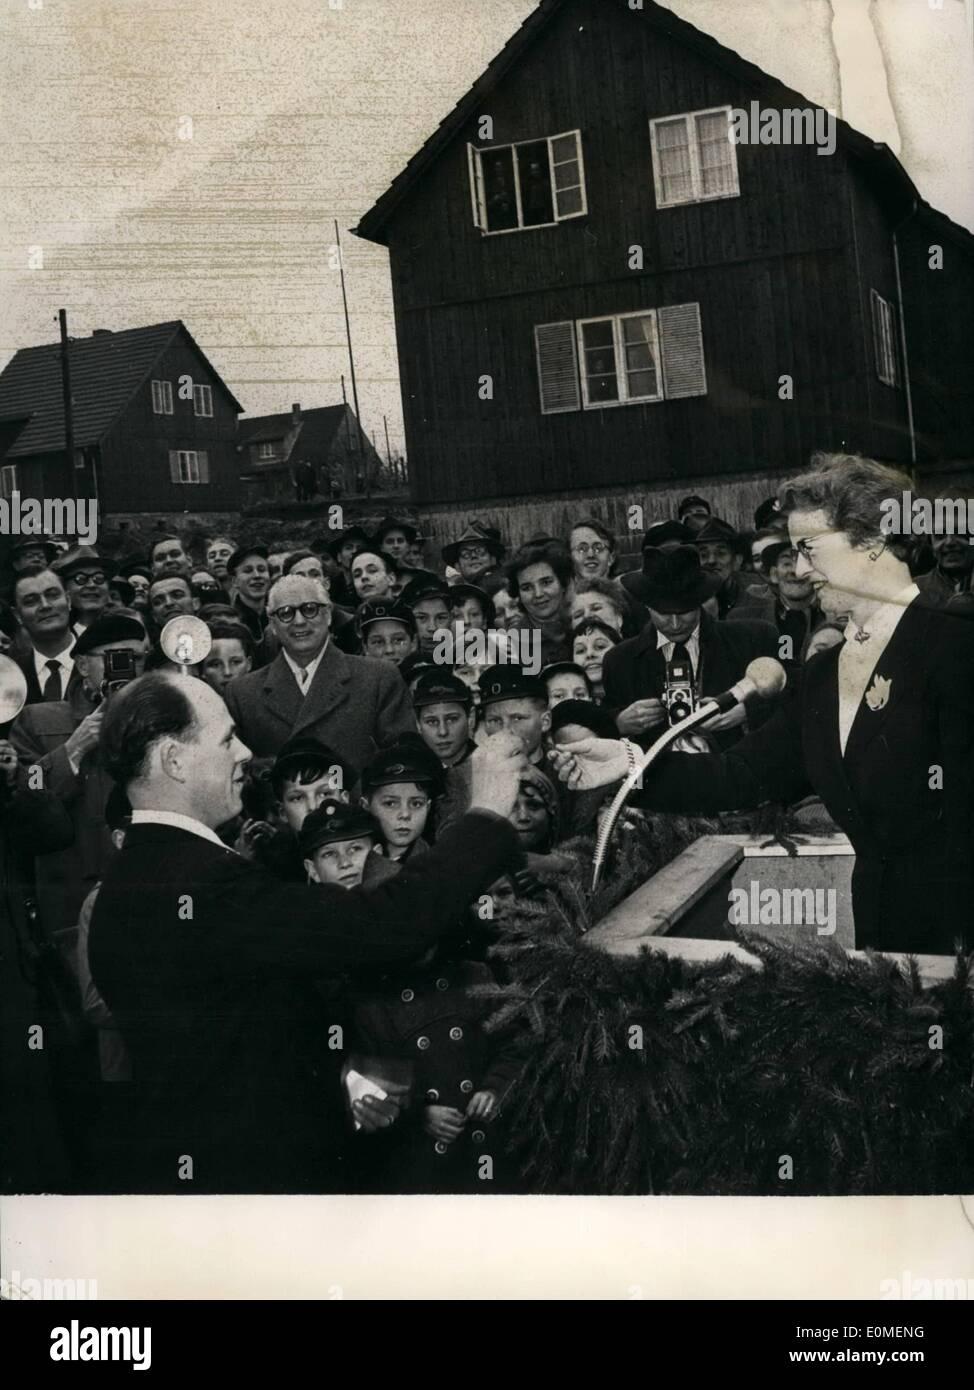 Feb  02, 1955 - Norwegian wood-houses for German refuge-families The